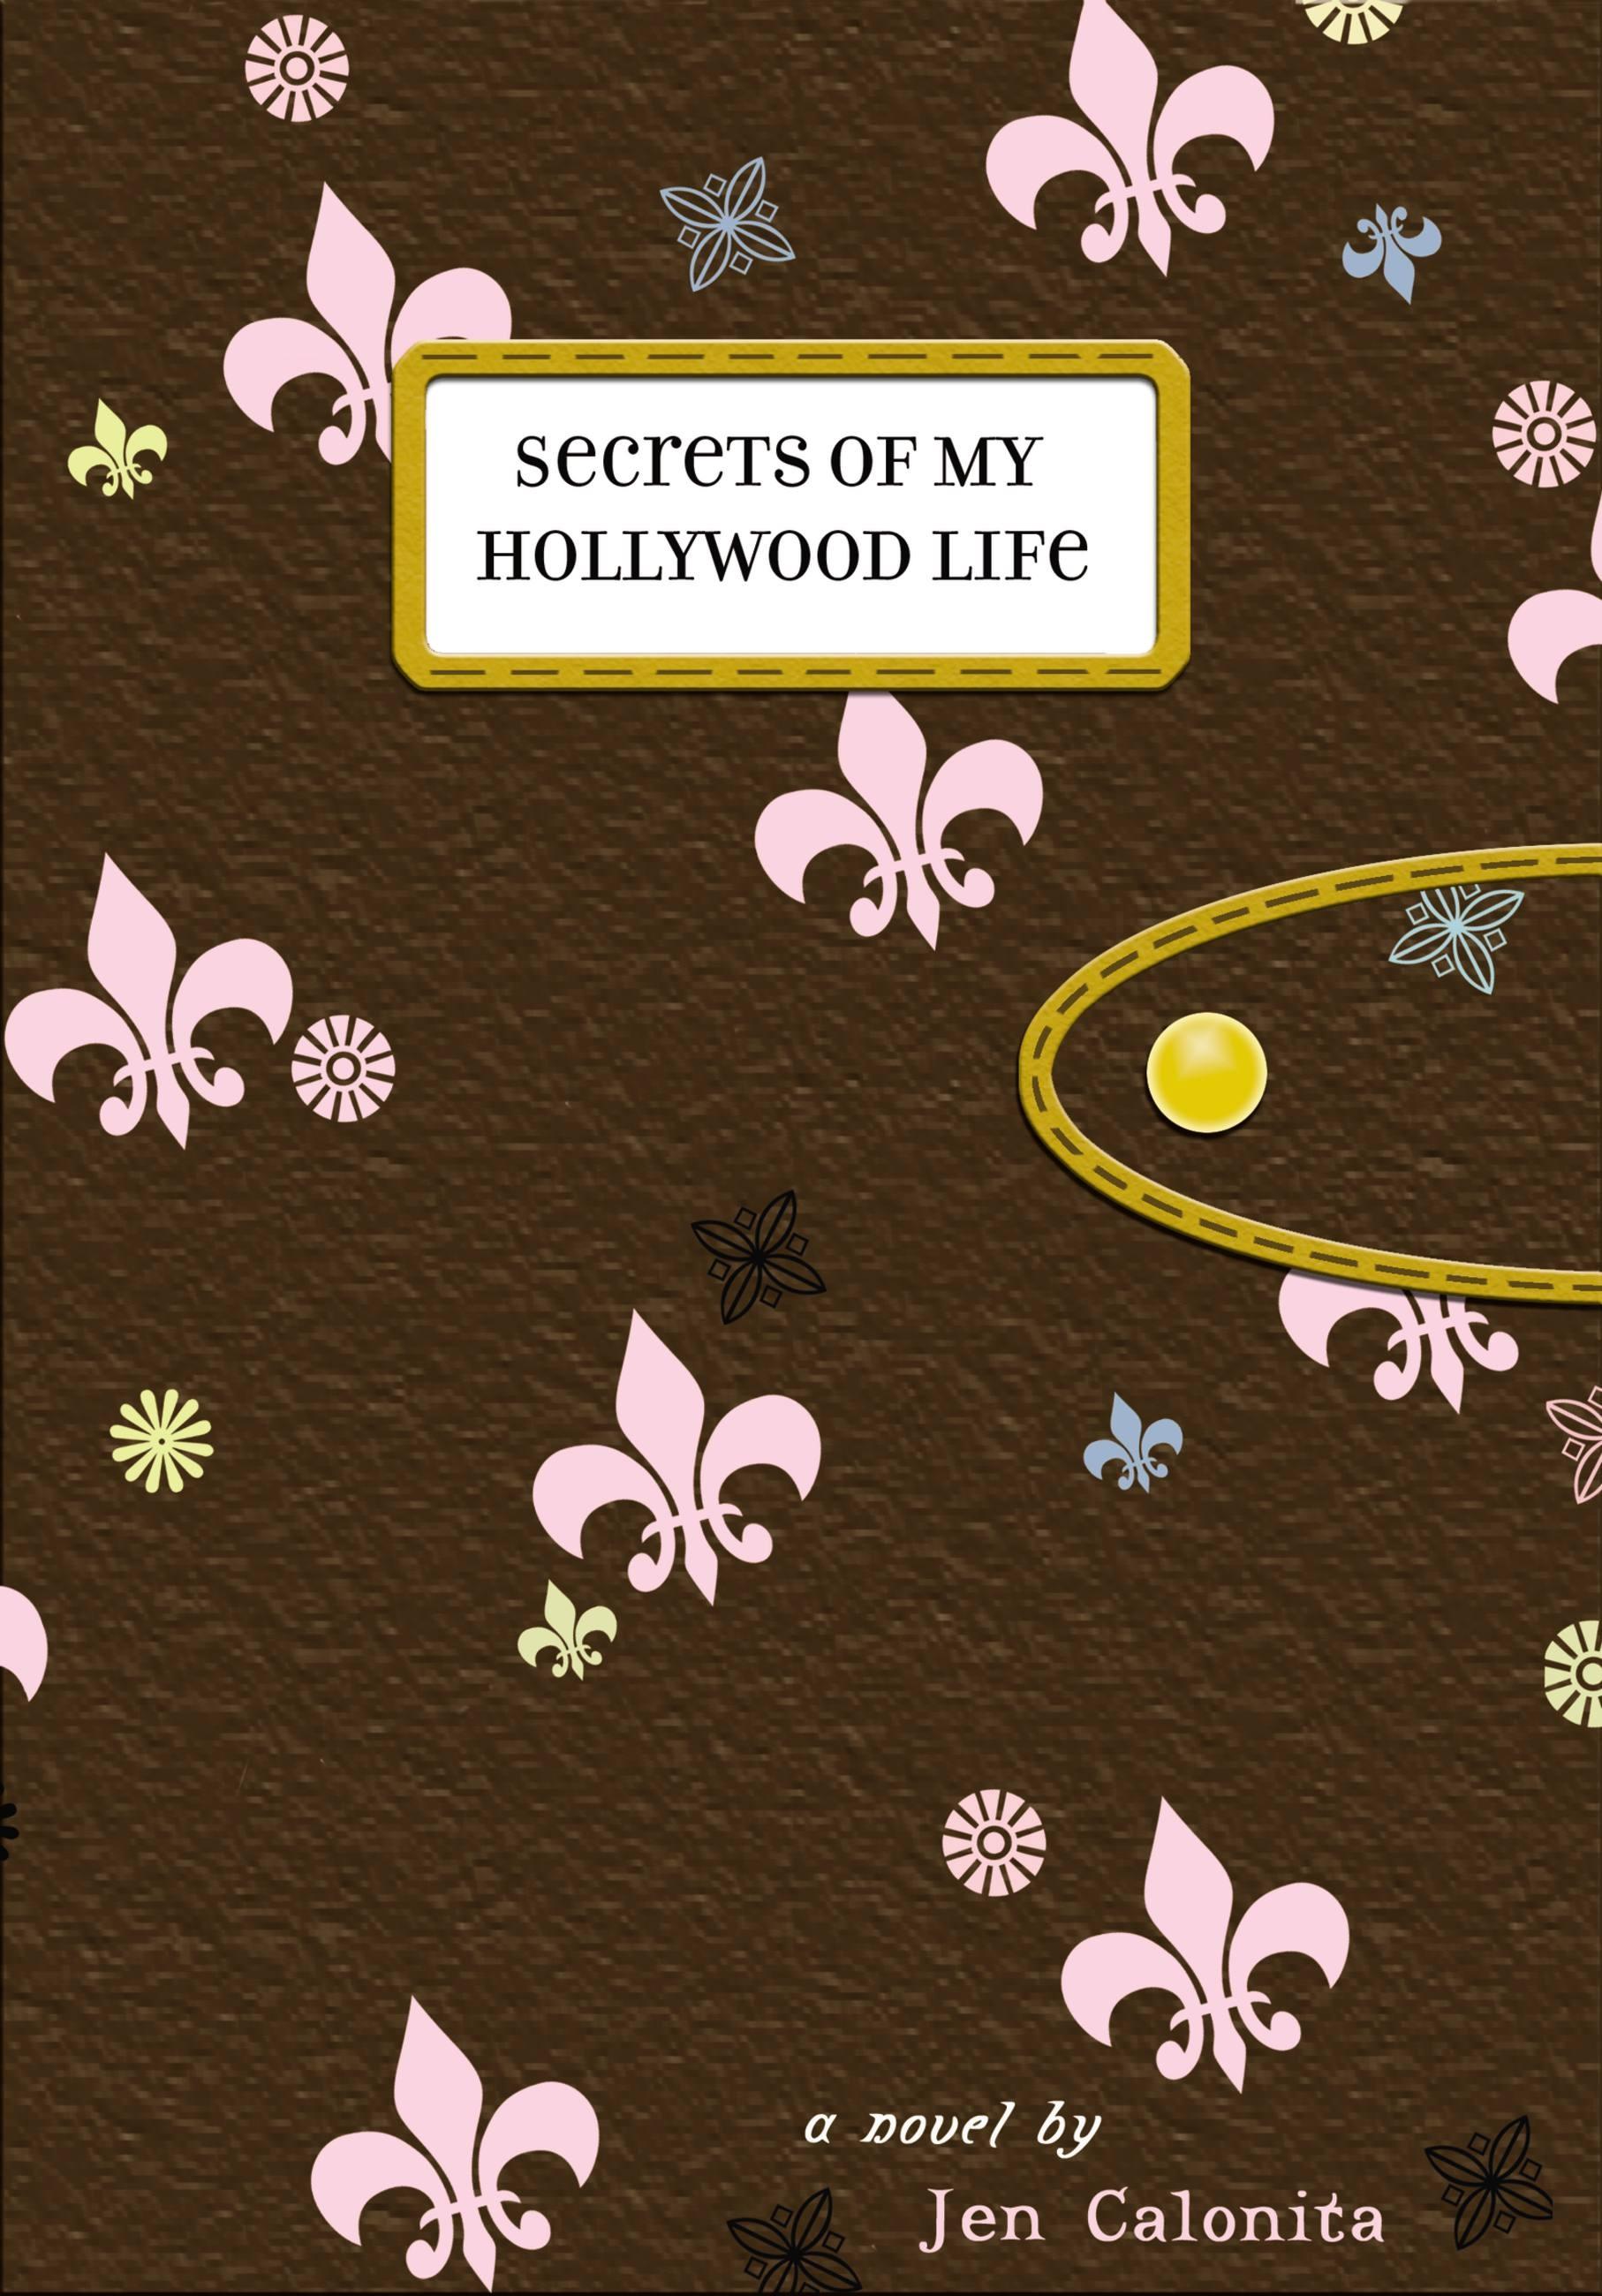 jen-calonita-secrets-hollywood-life.jpg